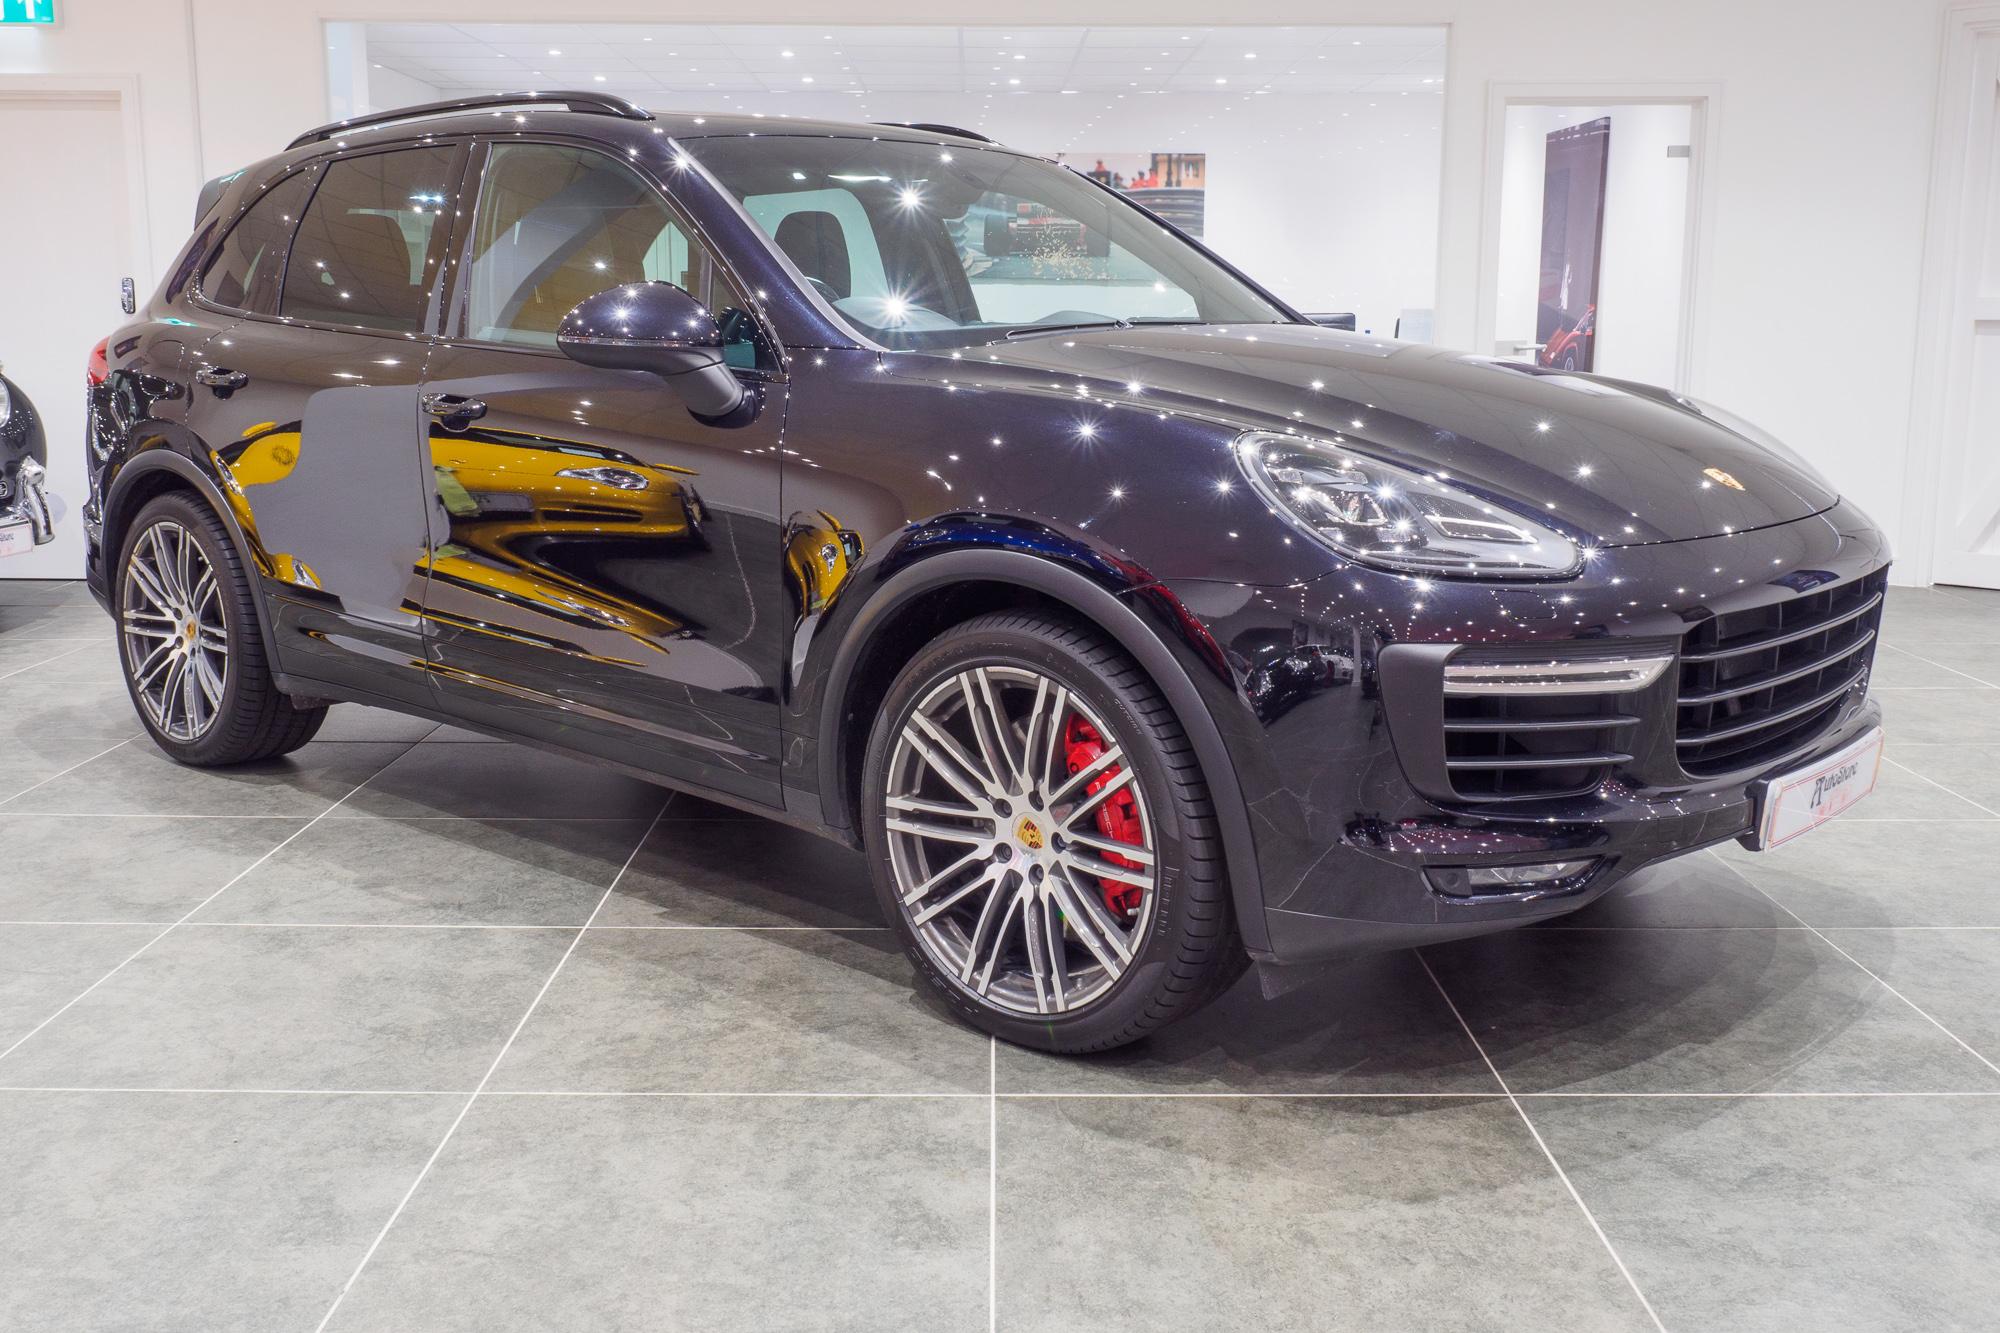 Autostore Sales - Porsche Cayenne Turbo